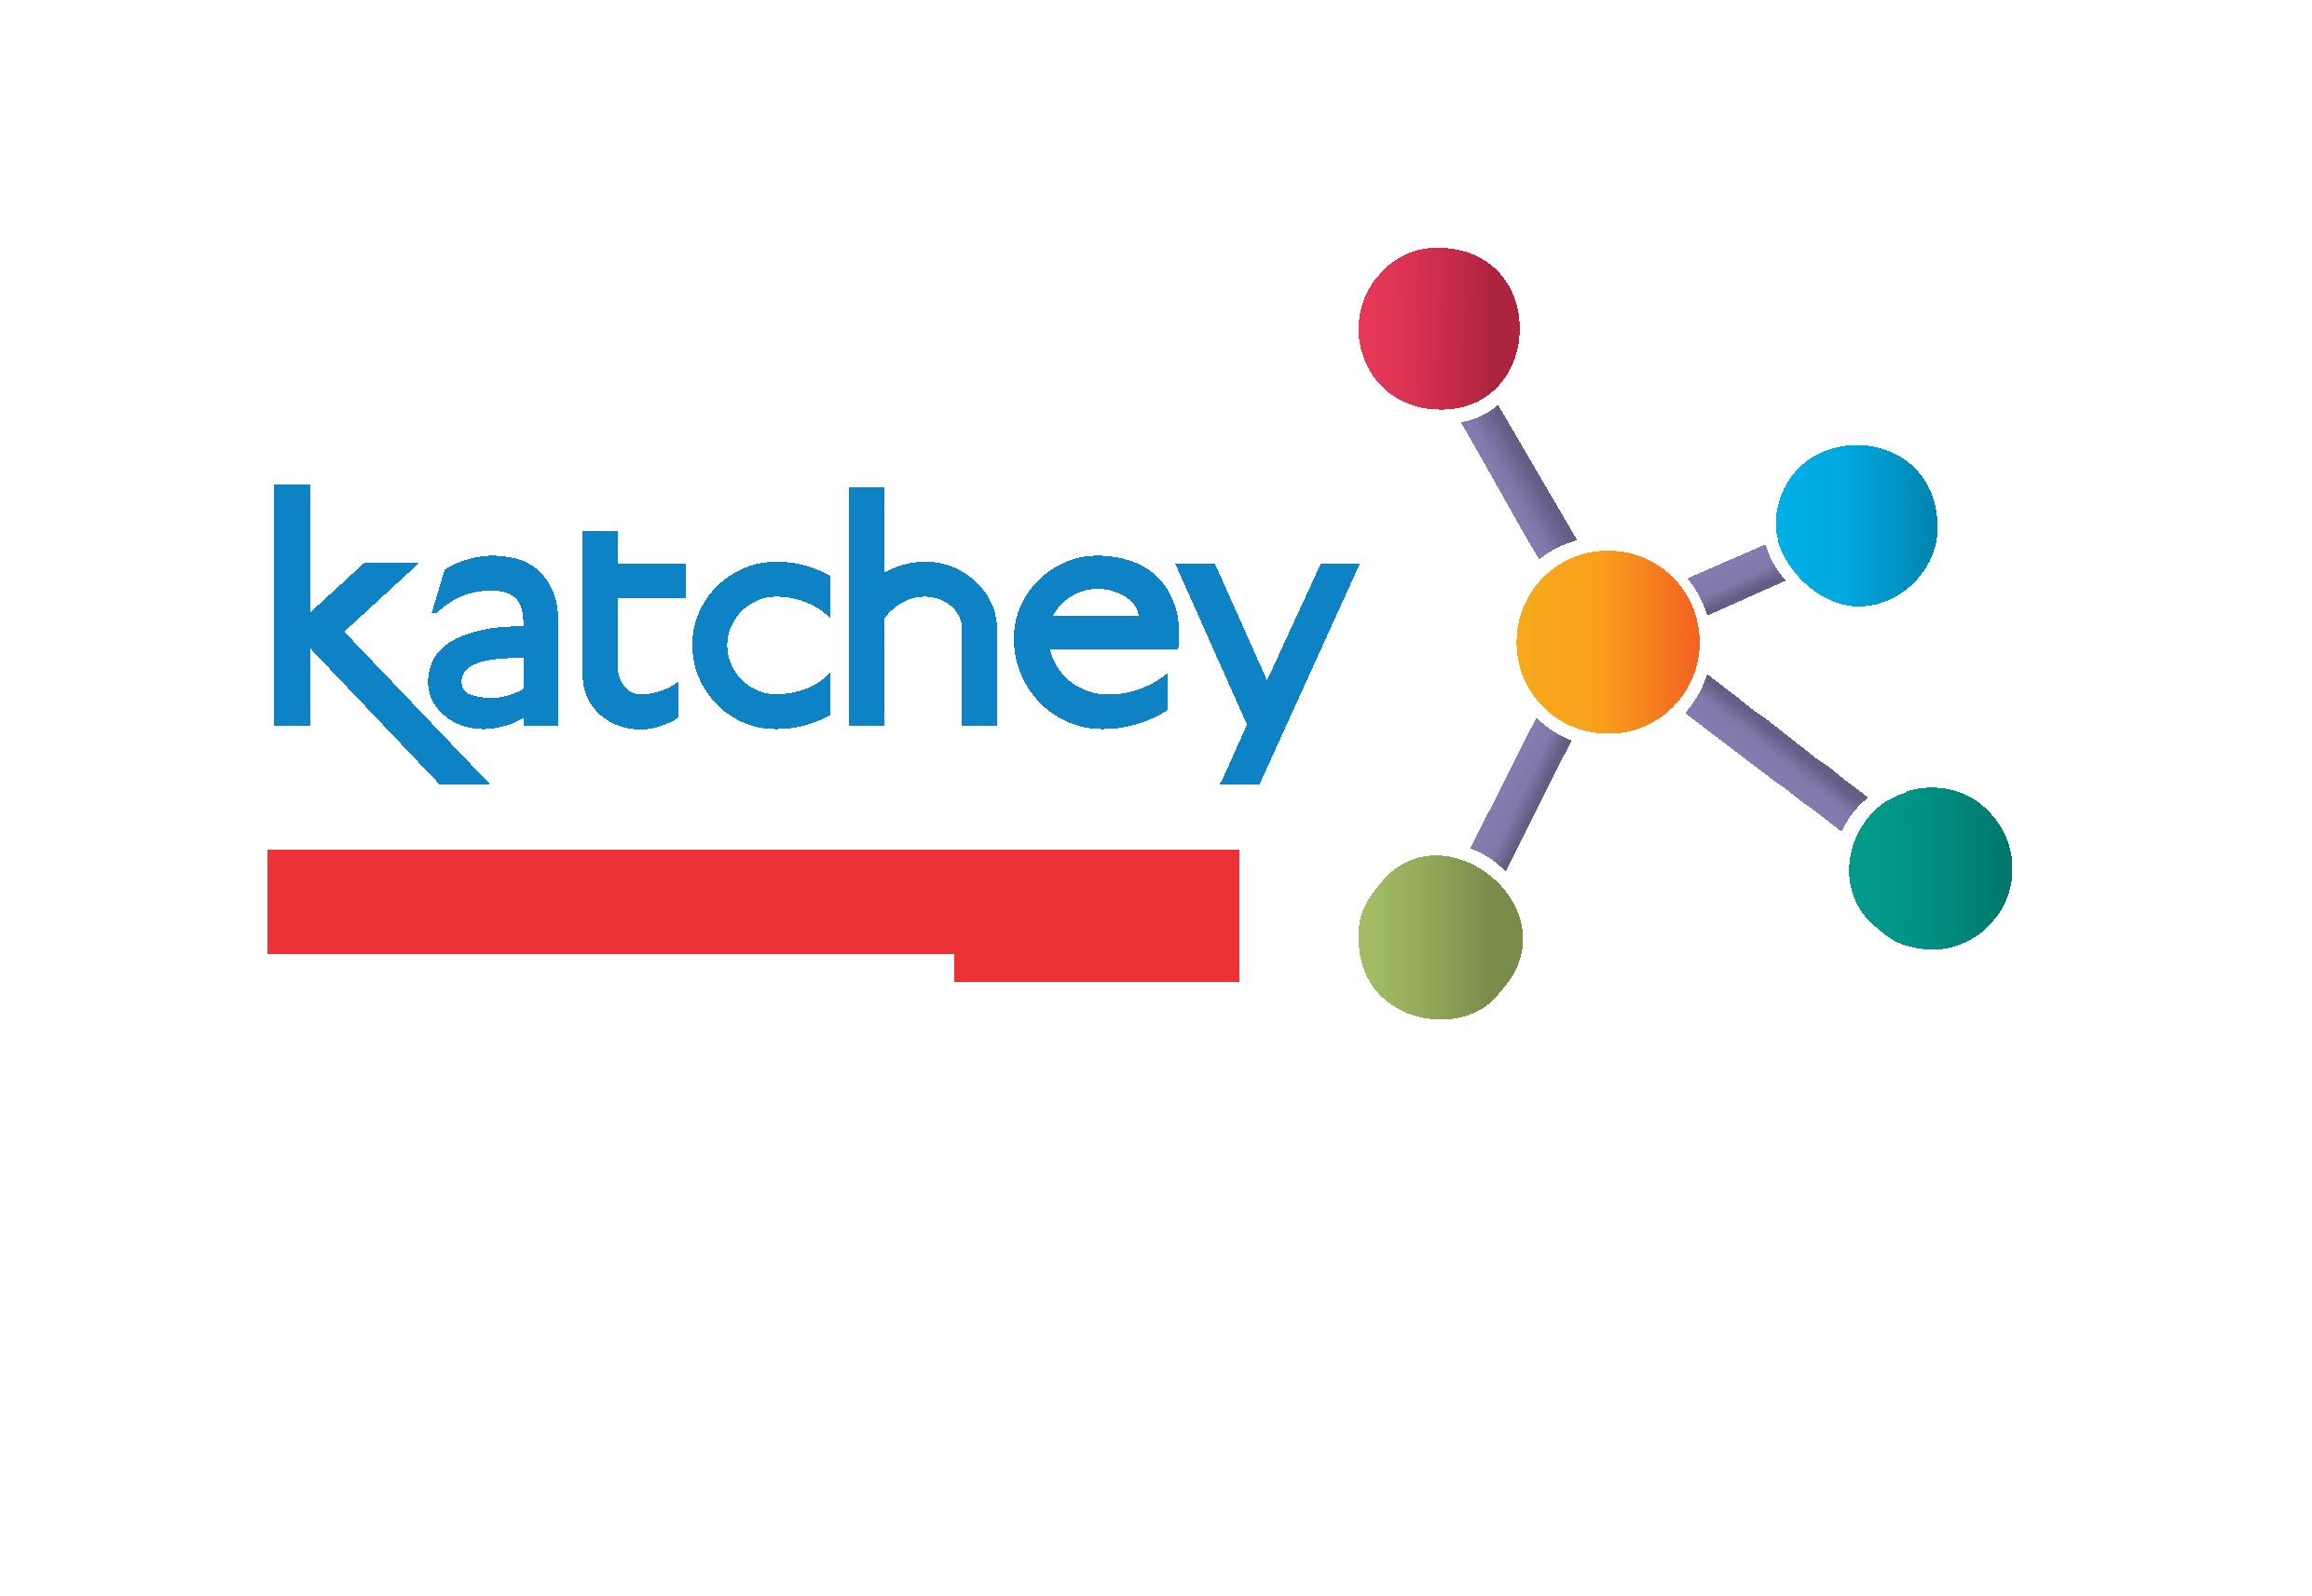 Katchey Company Limited